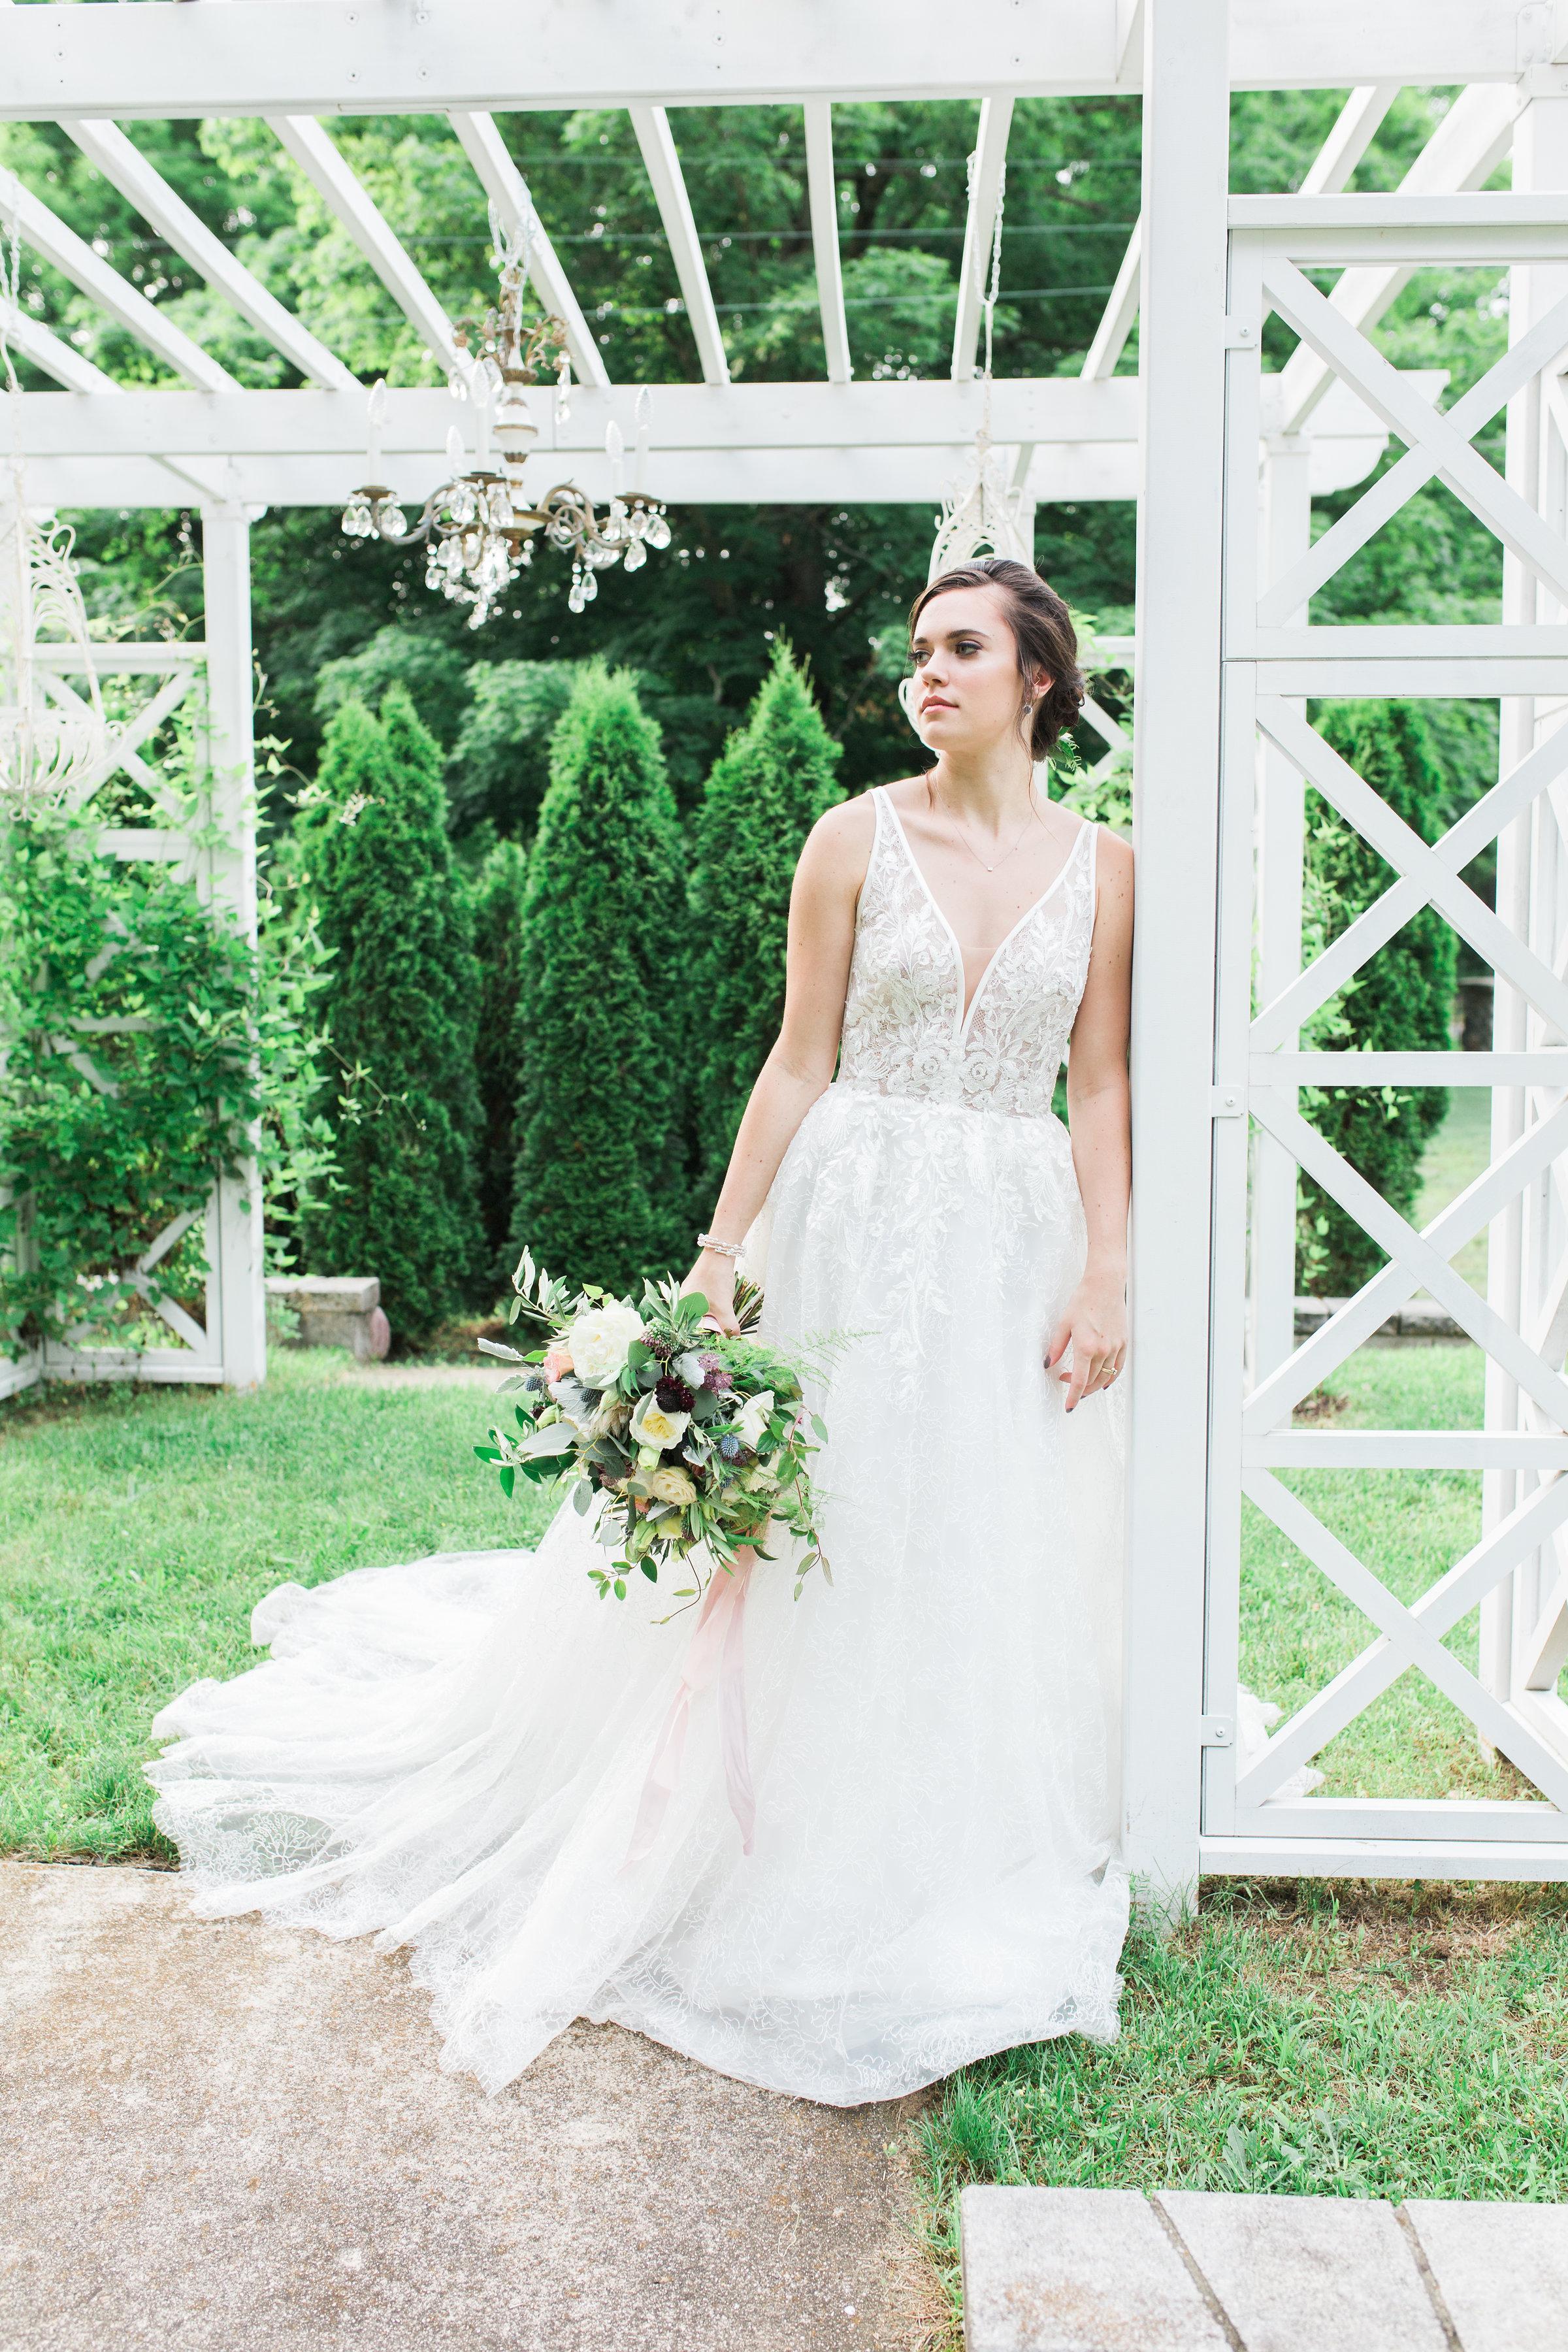 Glowing Bride   Photographer: Cynthia Boyle